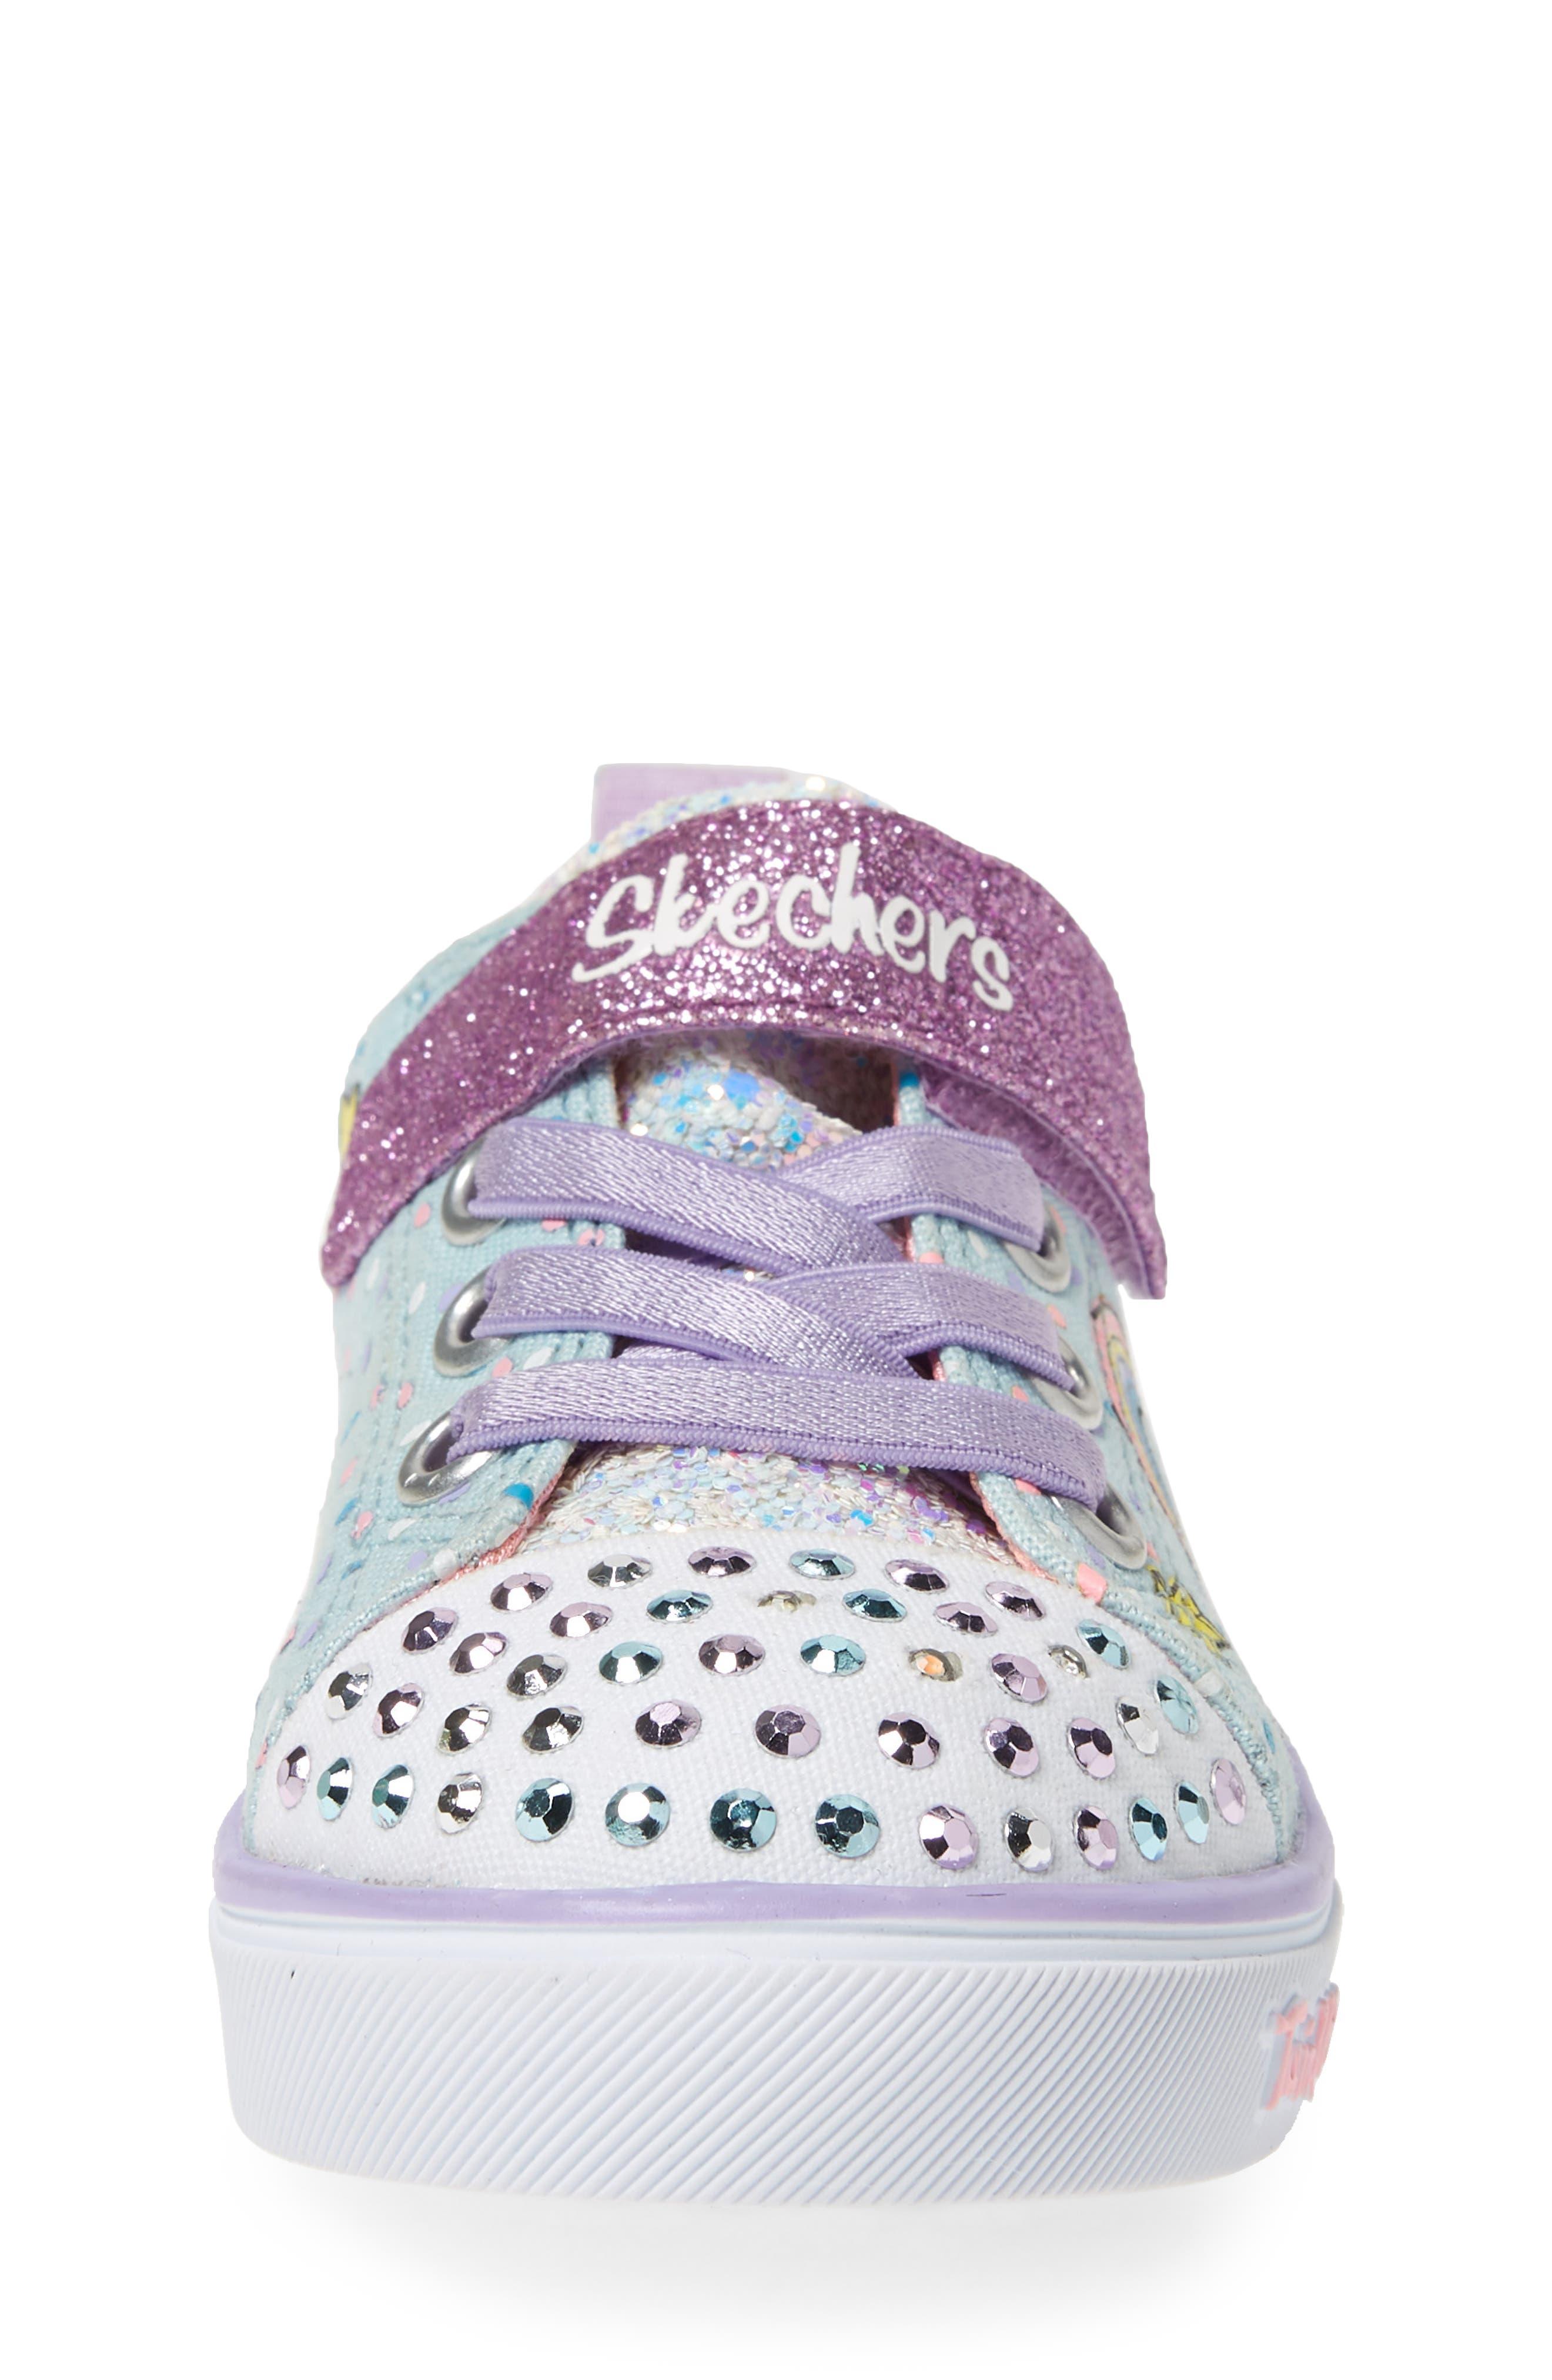 Twinkle Toes Unicorn Light-Up Sneaker,                             Alternate thumbnail 4, color,                             LIGHT BLUE/ MULTI